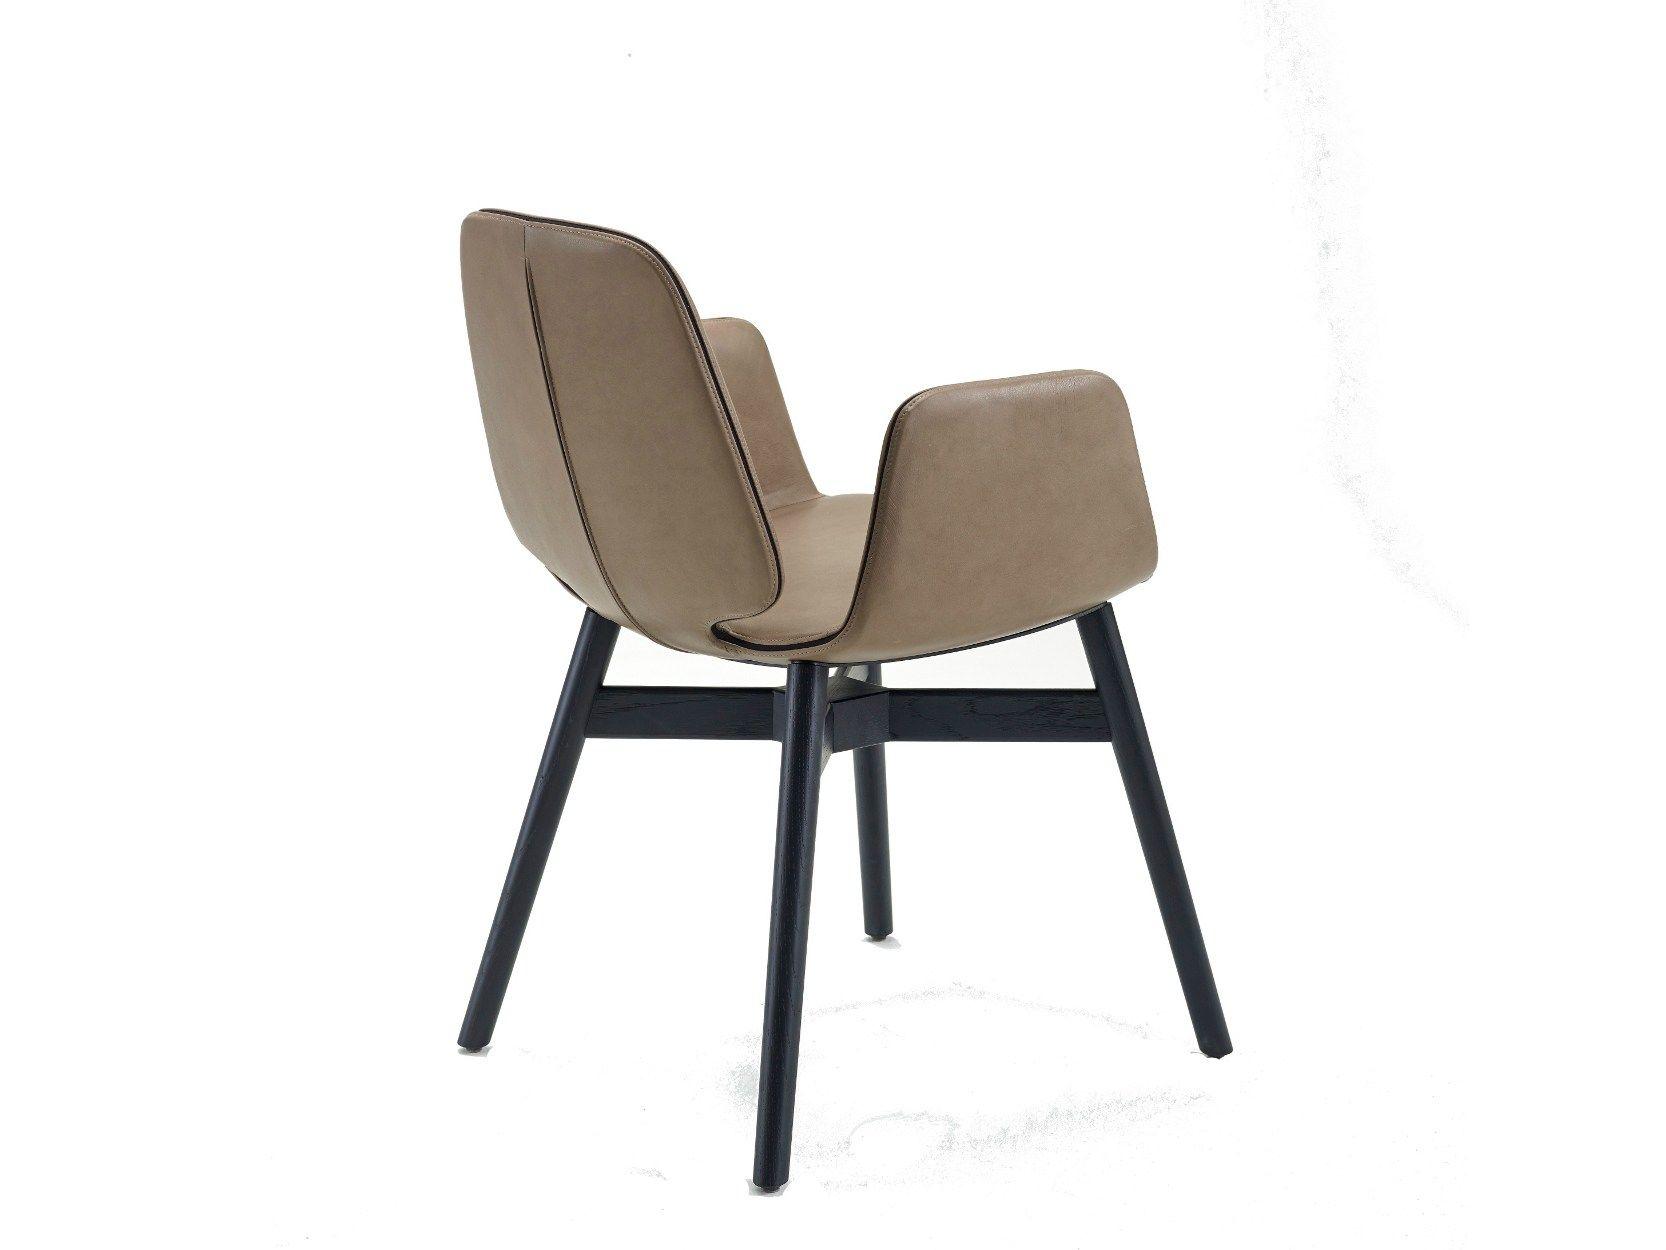 Tilda Chaise Avec Accoudoirs By Freifrau Design Birgit Hoffmann Christoph Kahleyss Chaise Salle A Manger Chaise Accoudoir Chaises Rembourrees